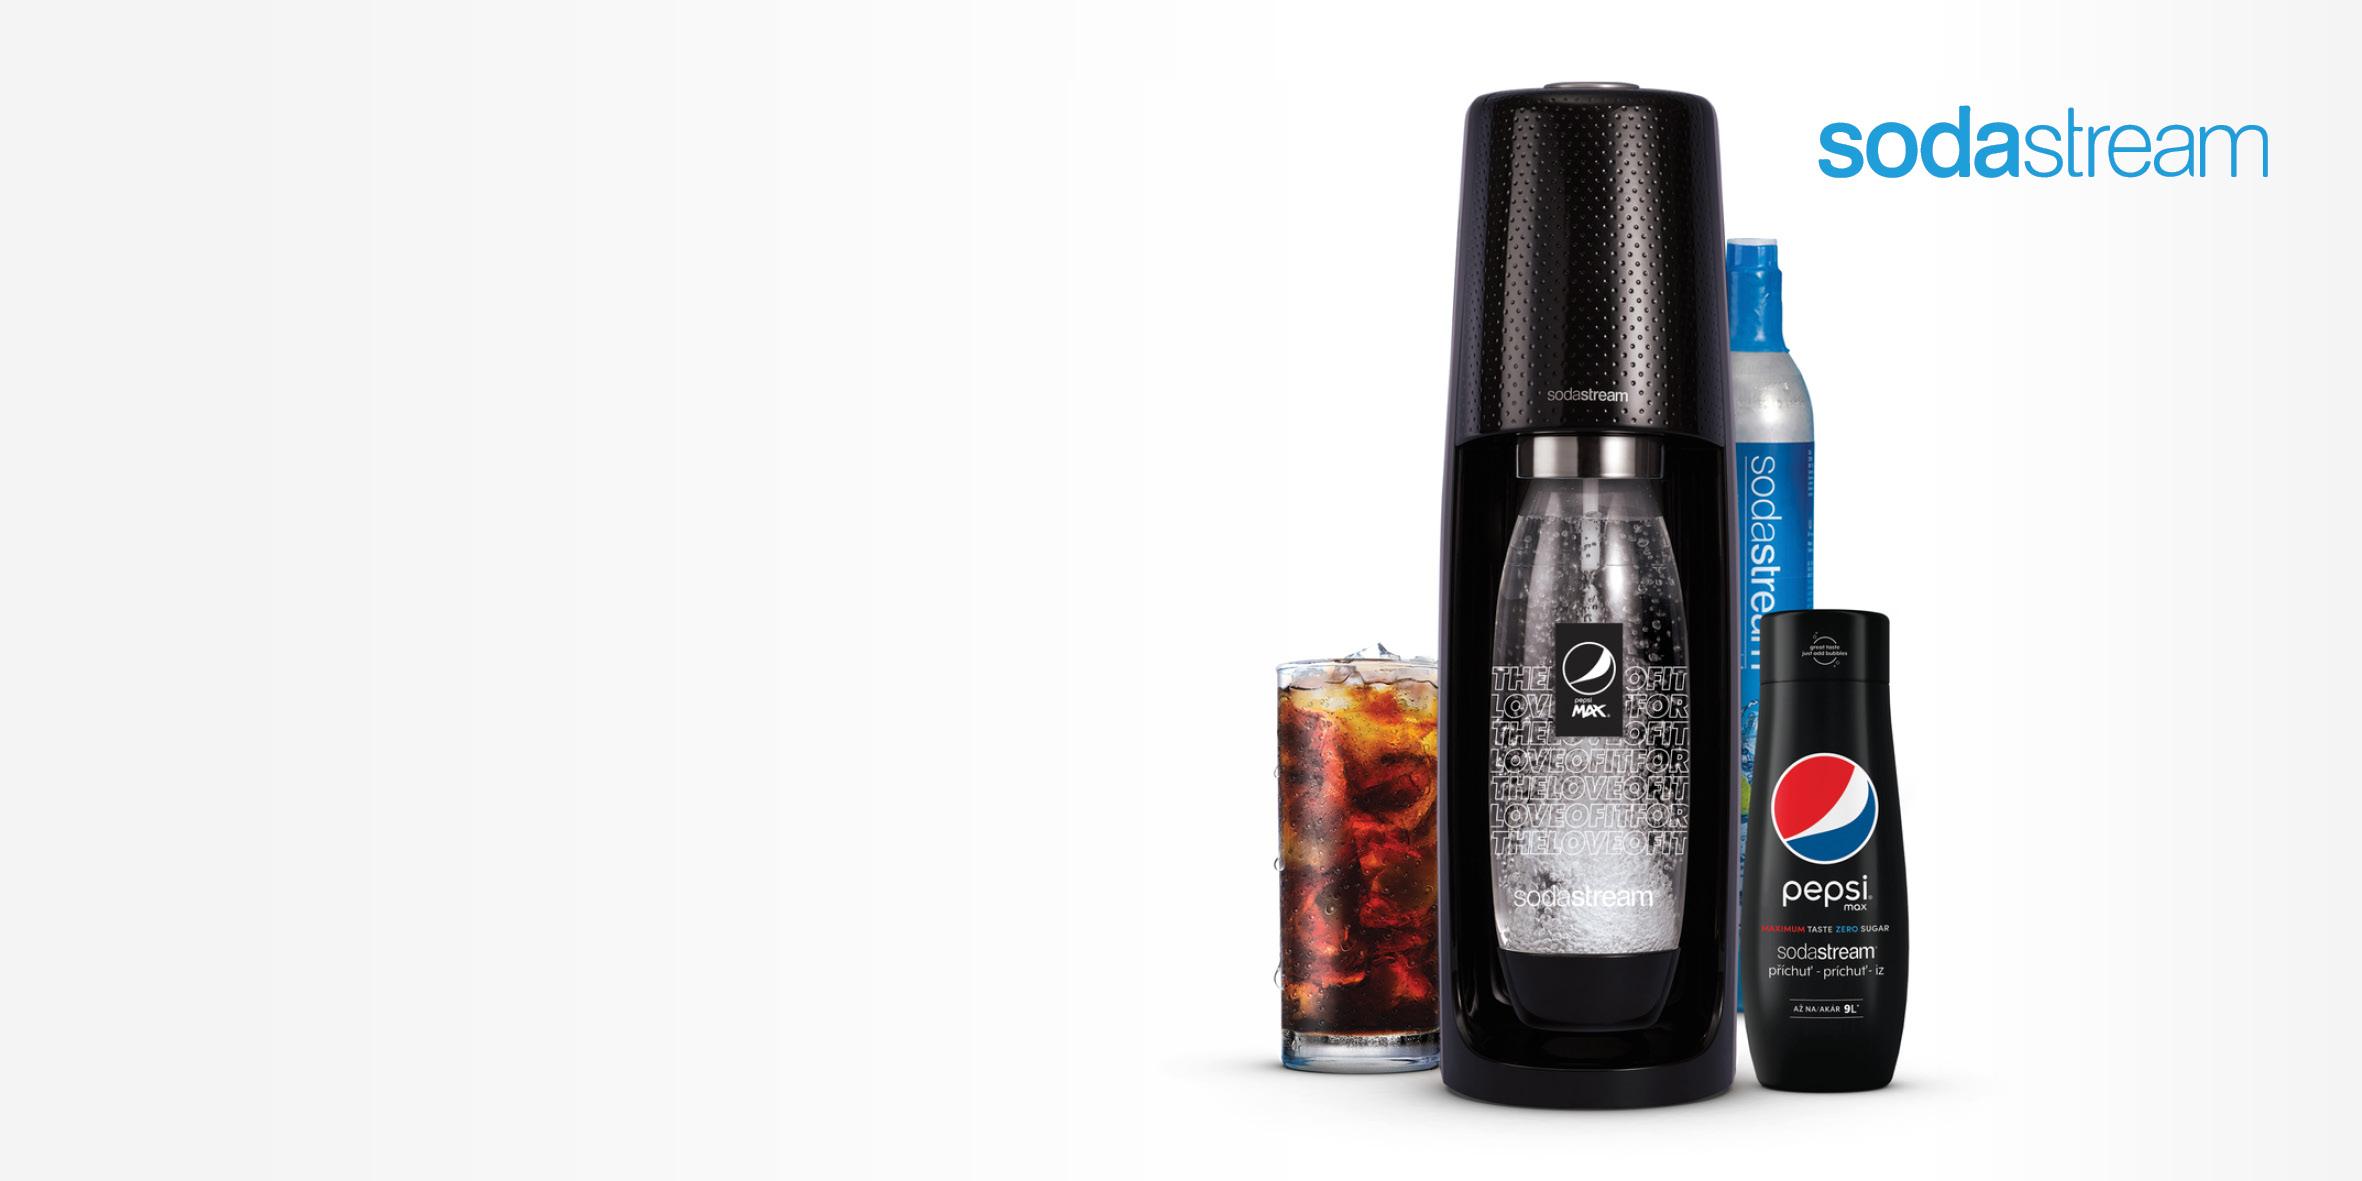 Sodastream výrobník SPIRIT PEPSI MegaPack